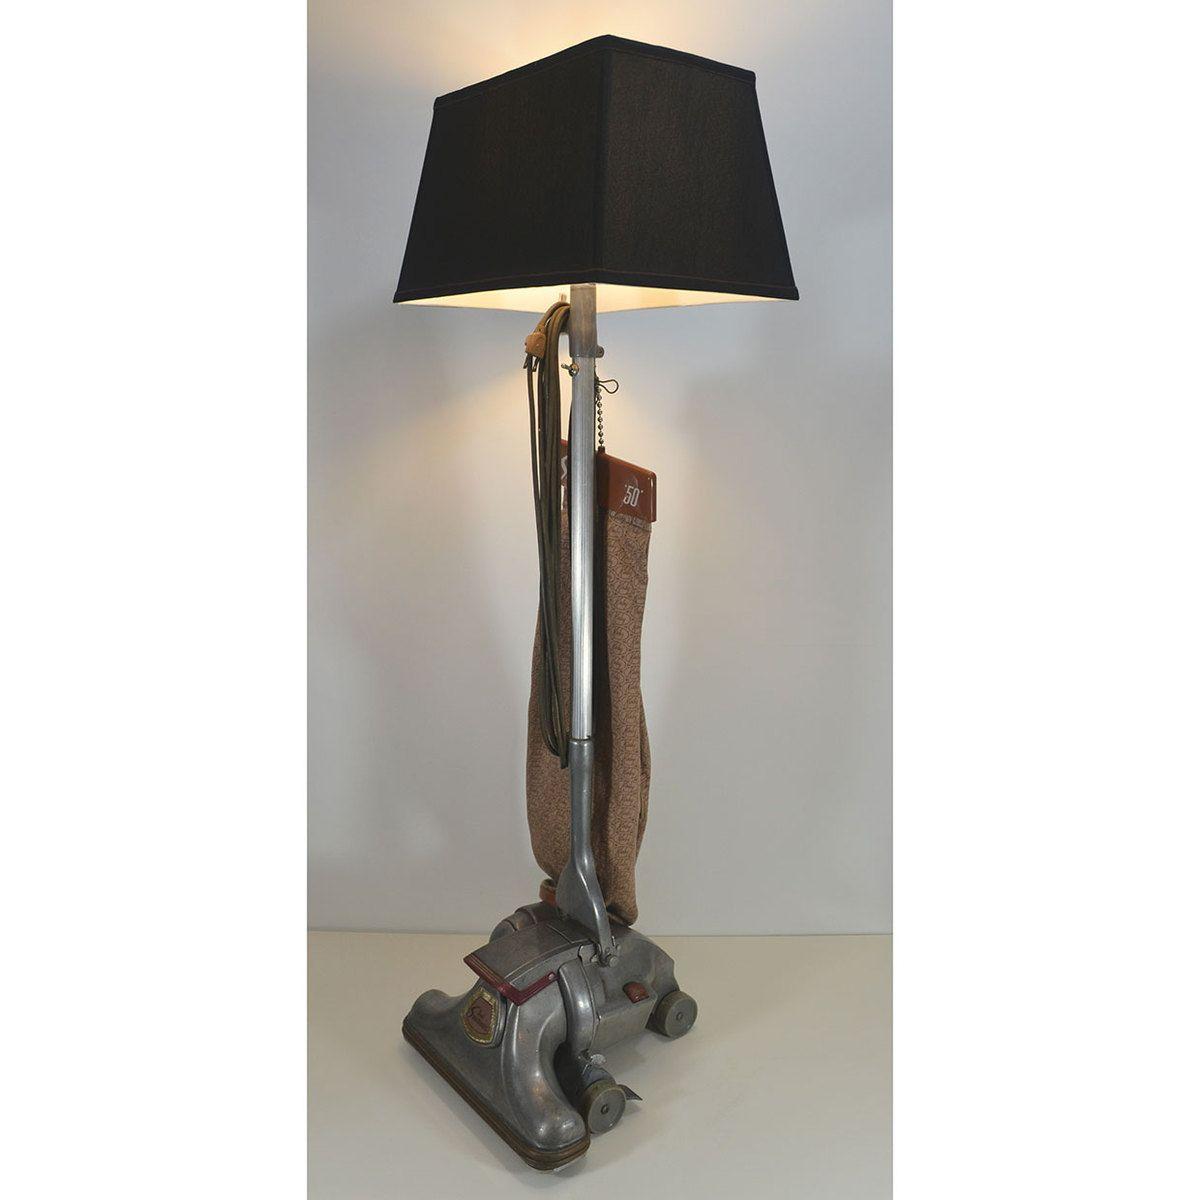 fab com kirby vacuum cleaner floor lamp 1199 art ideas fab com kirby vacuum cleaner floor lamp 1199